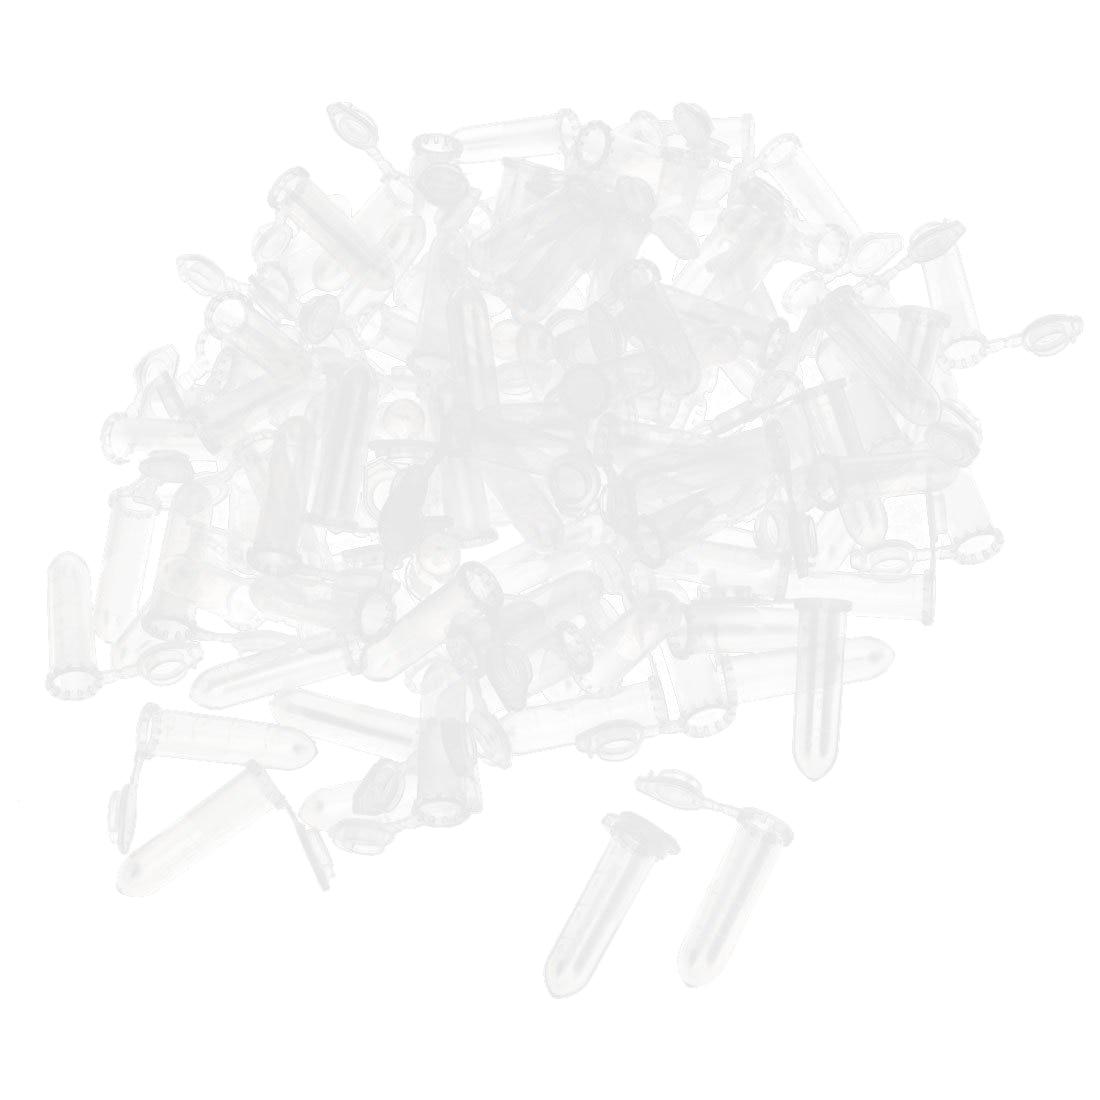 Sample Preparation Round Bottom Micro Centrifuge Tubes 2ml 500 Pcs